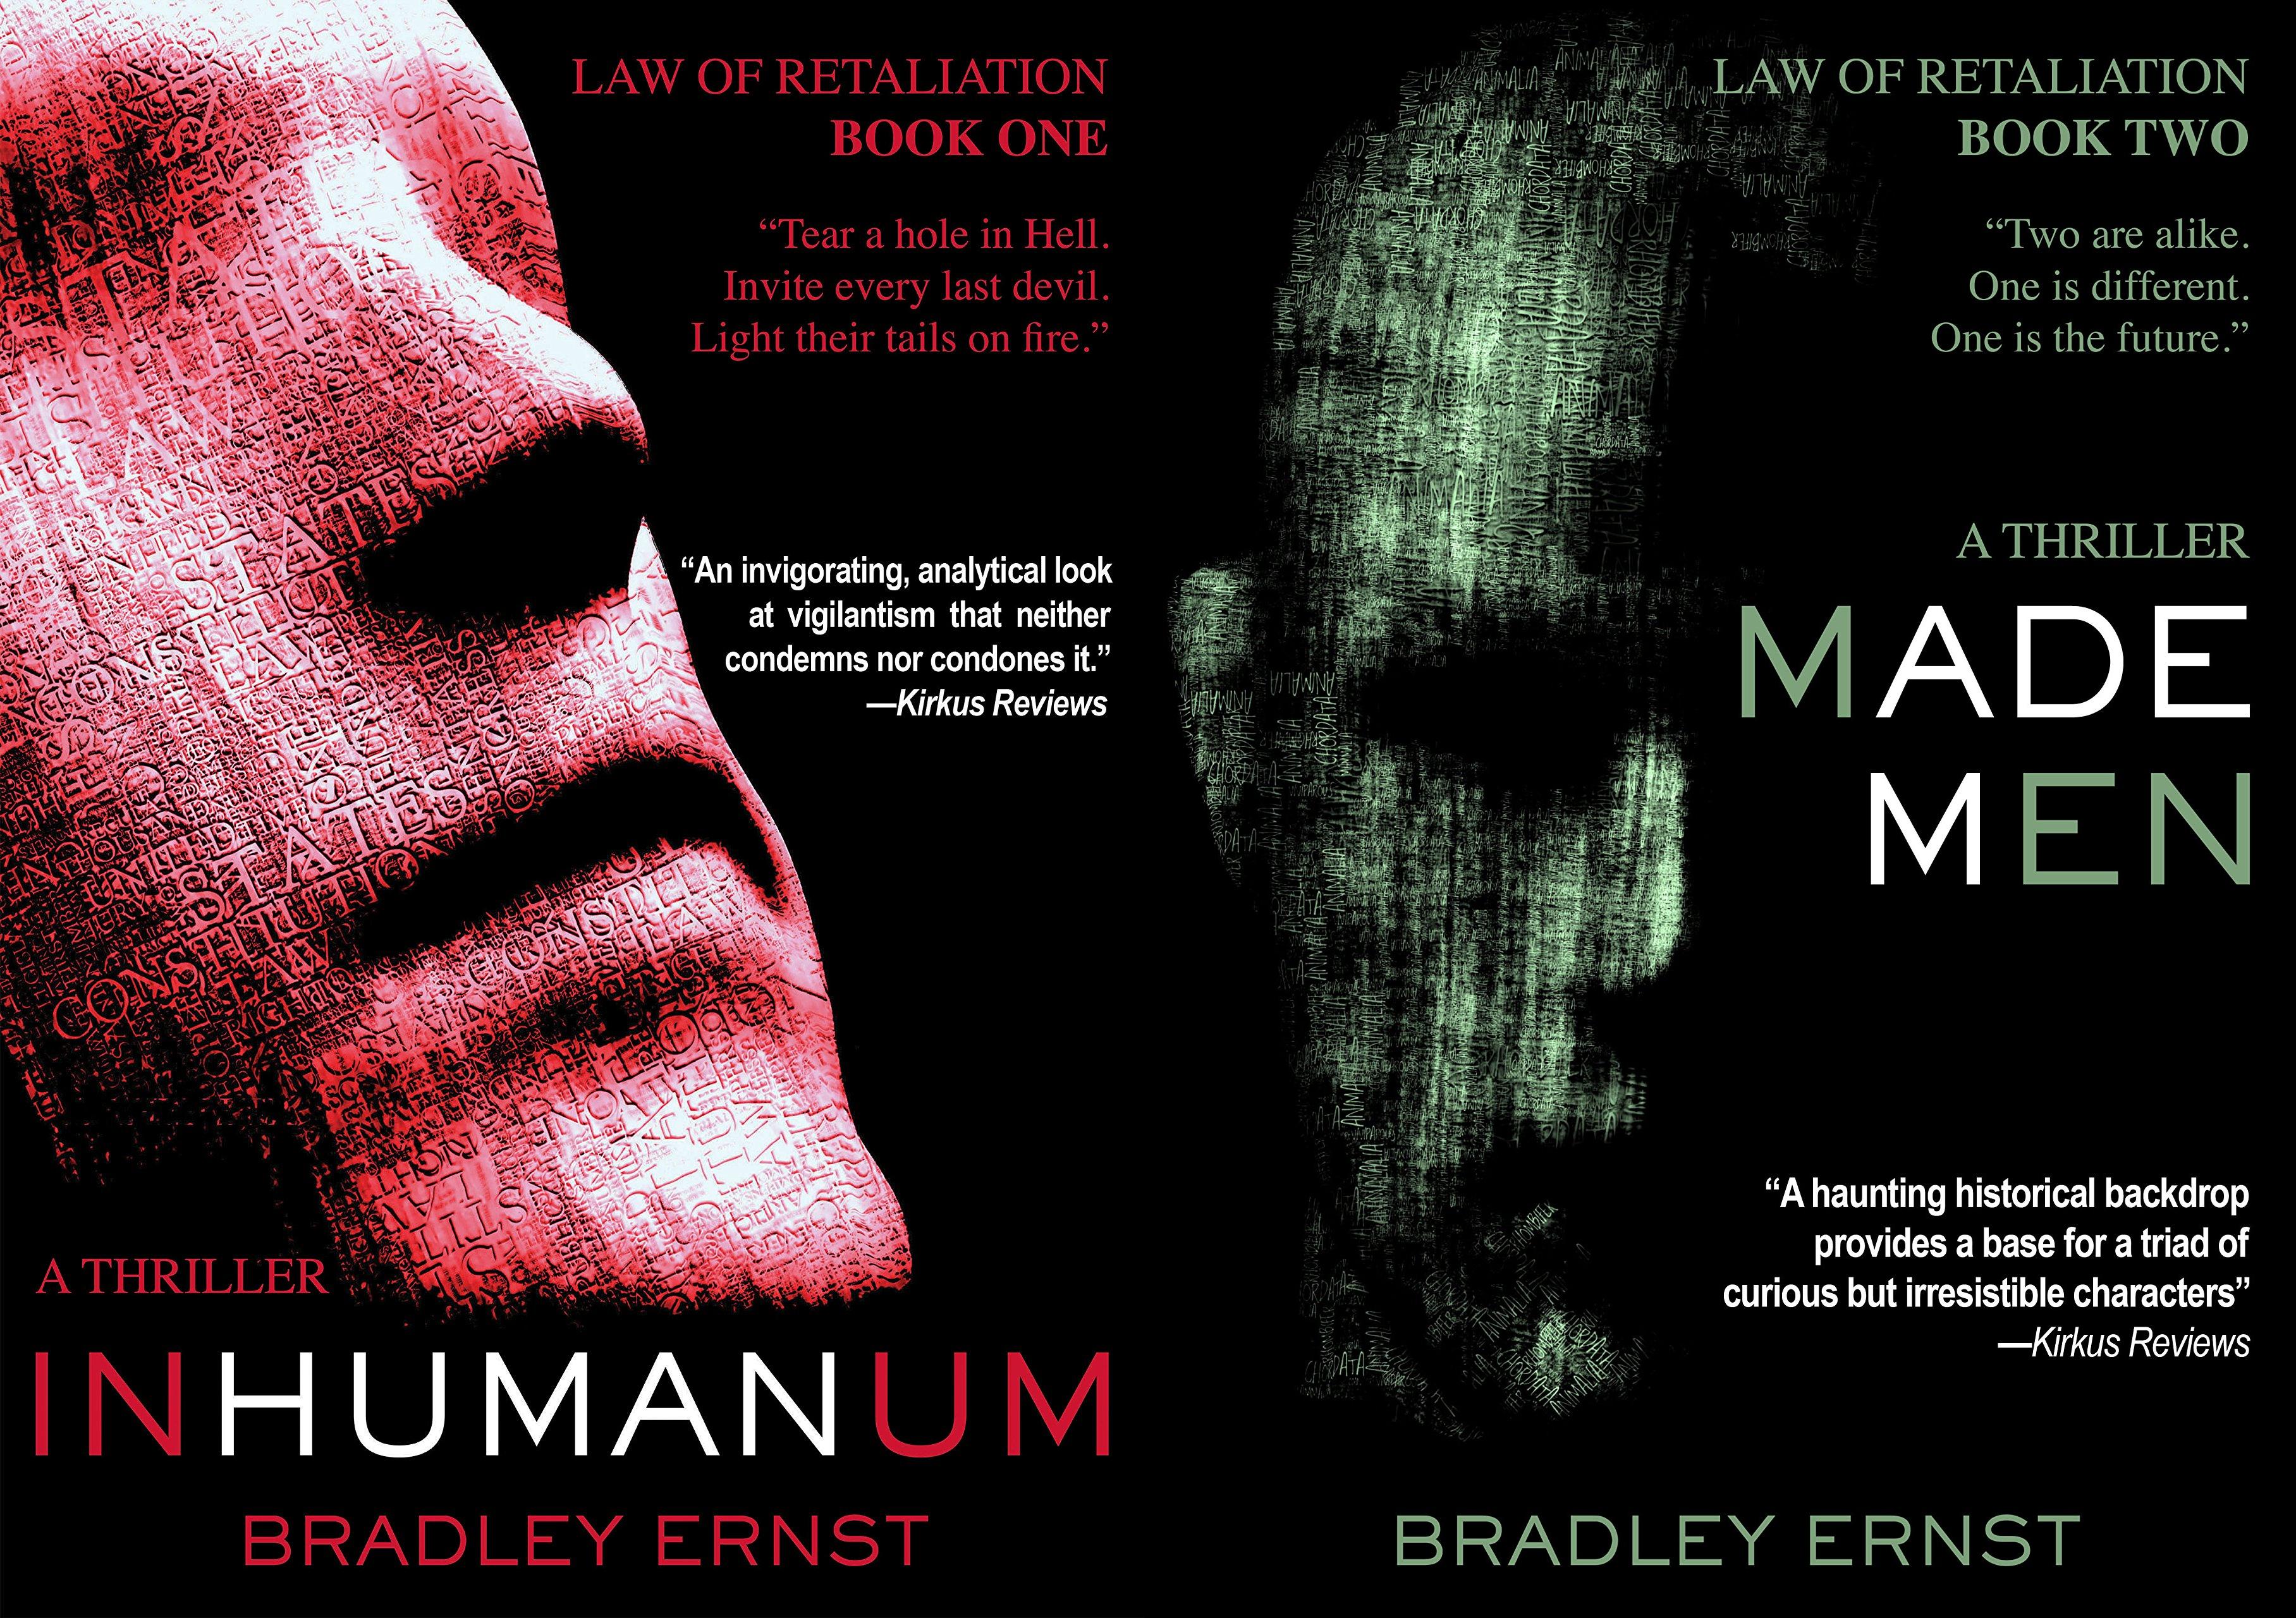 Law of Retaliation (2 Book Series)